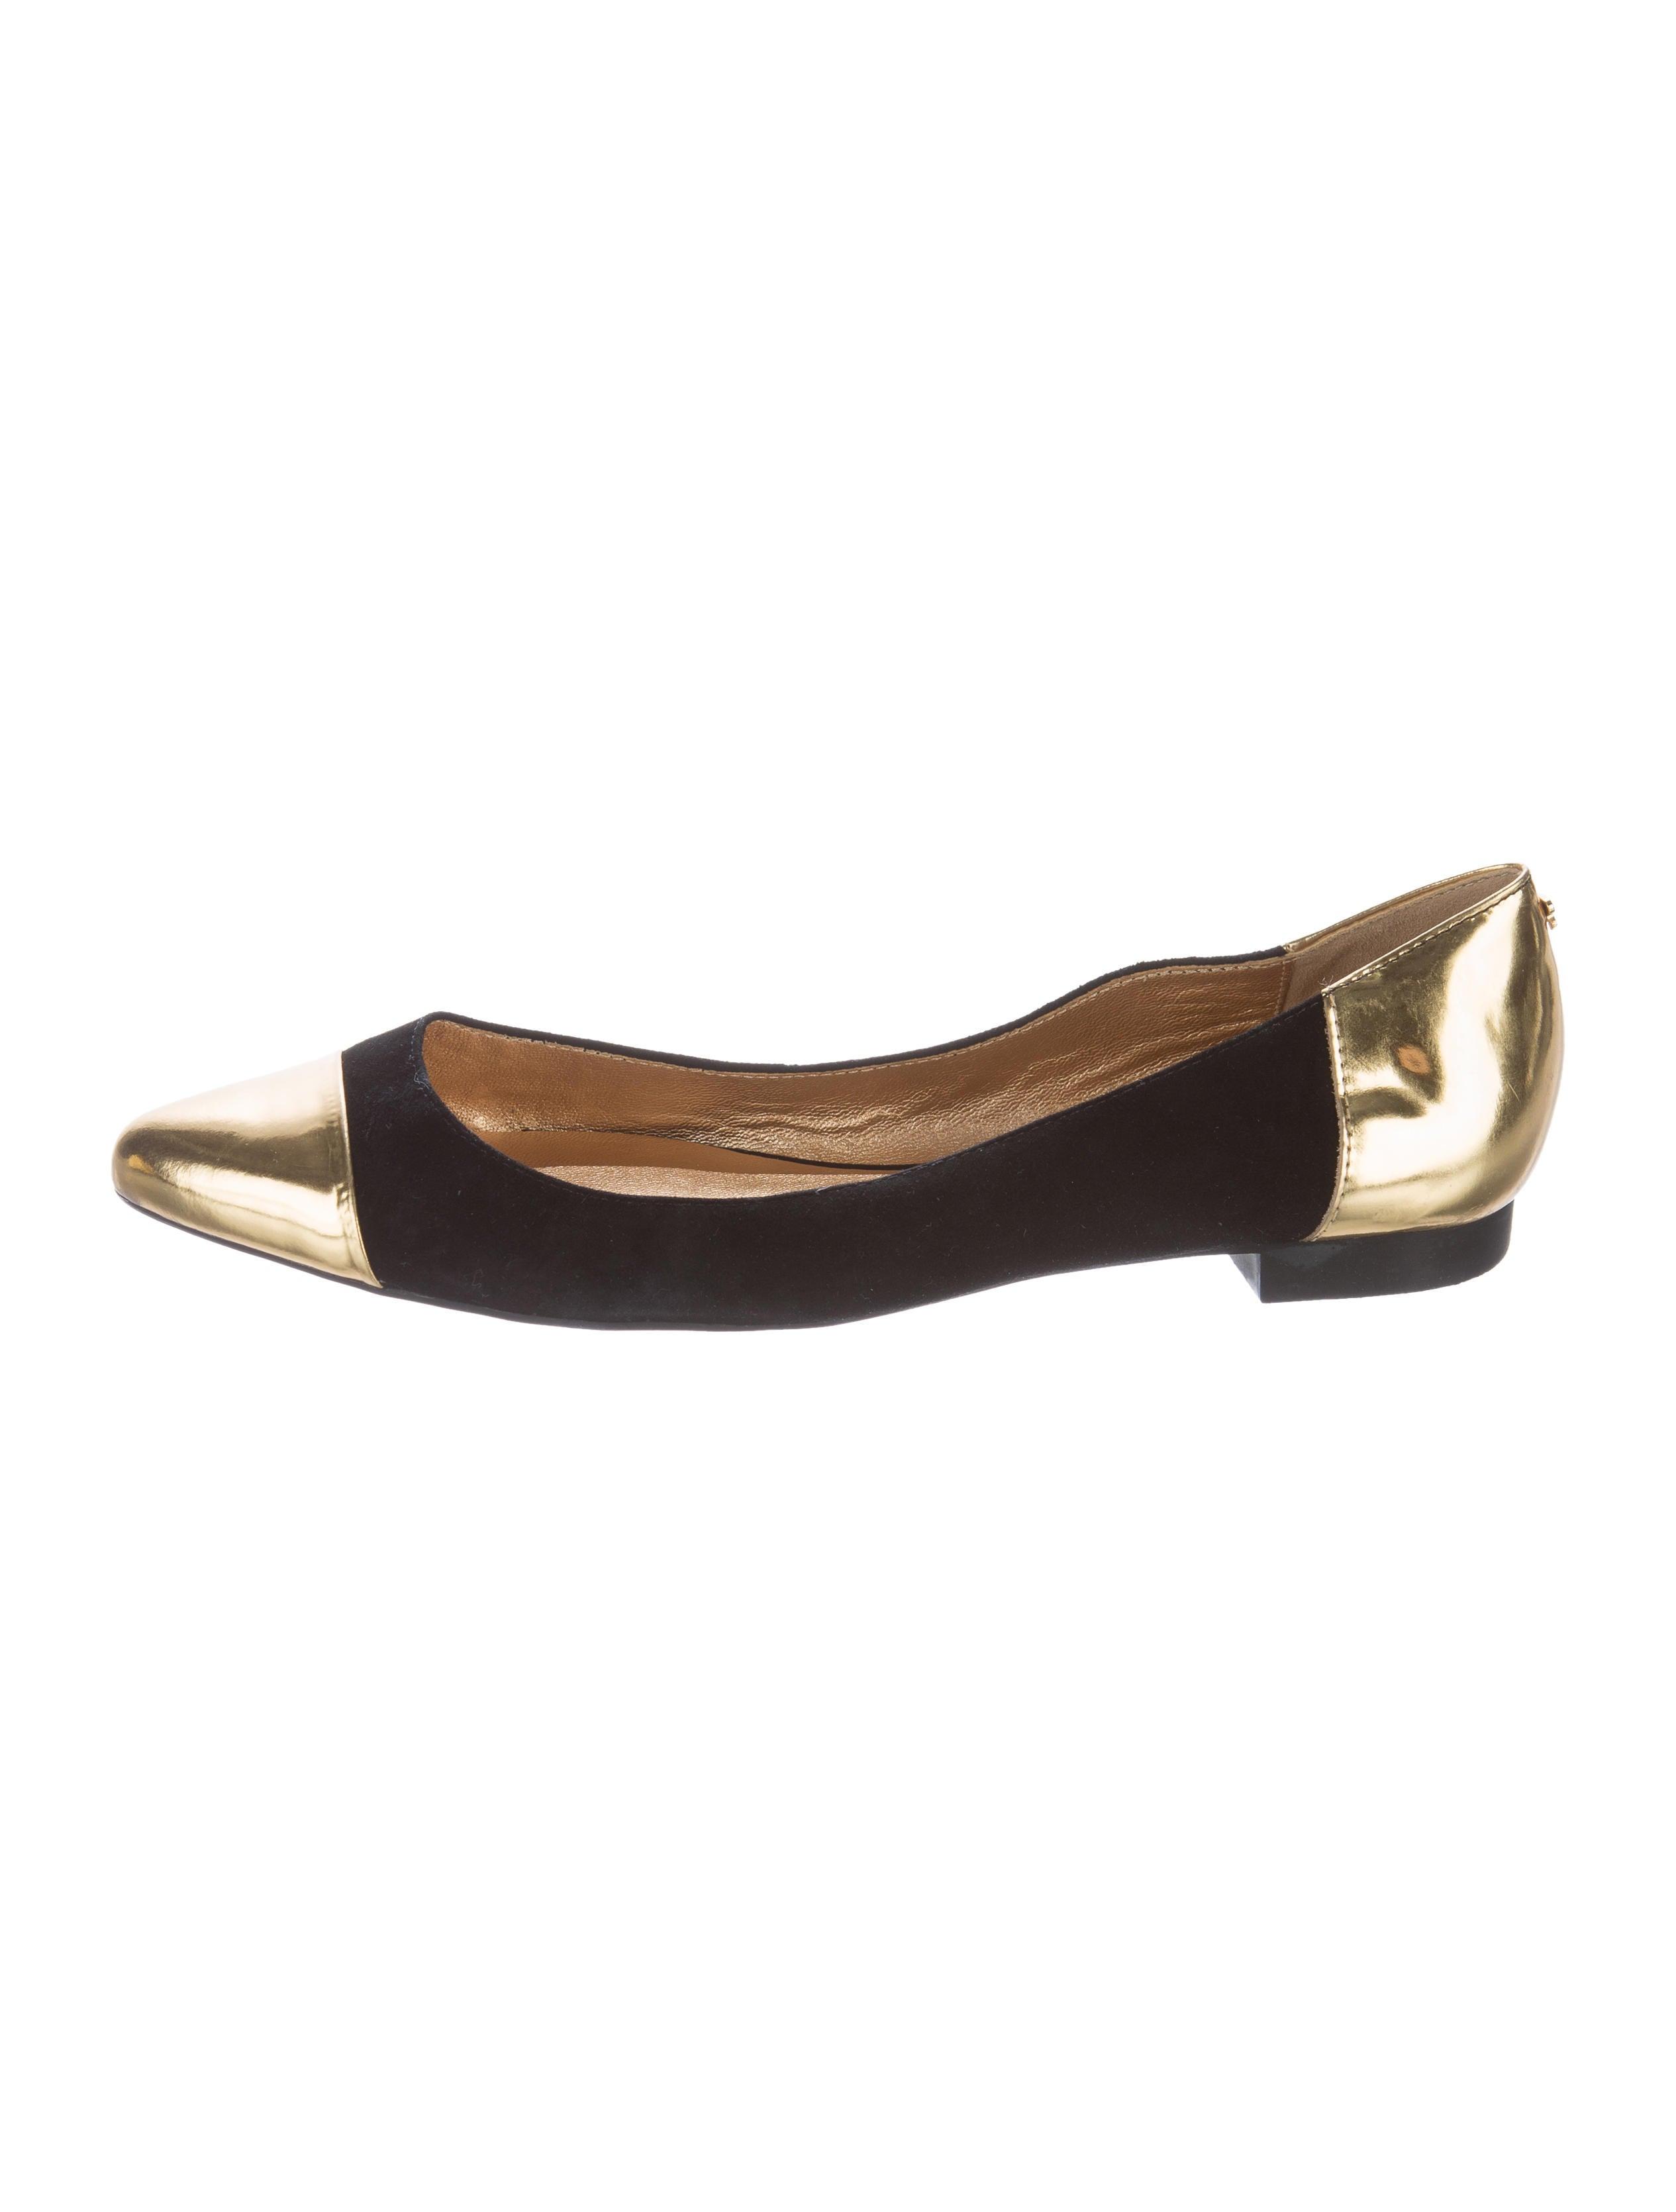 Kate spade new york metallic cap toe flats shoes for Kate spade new york flats